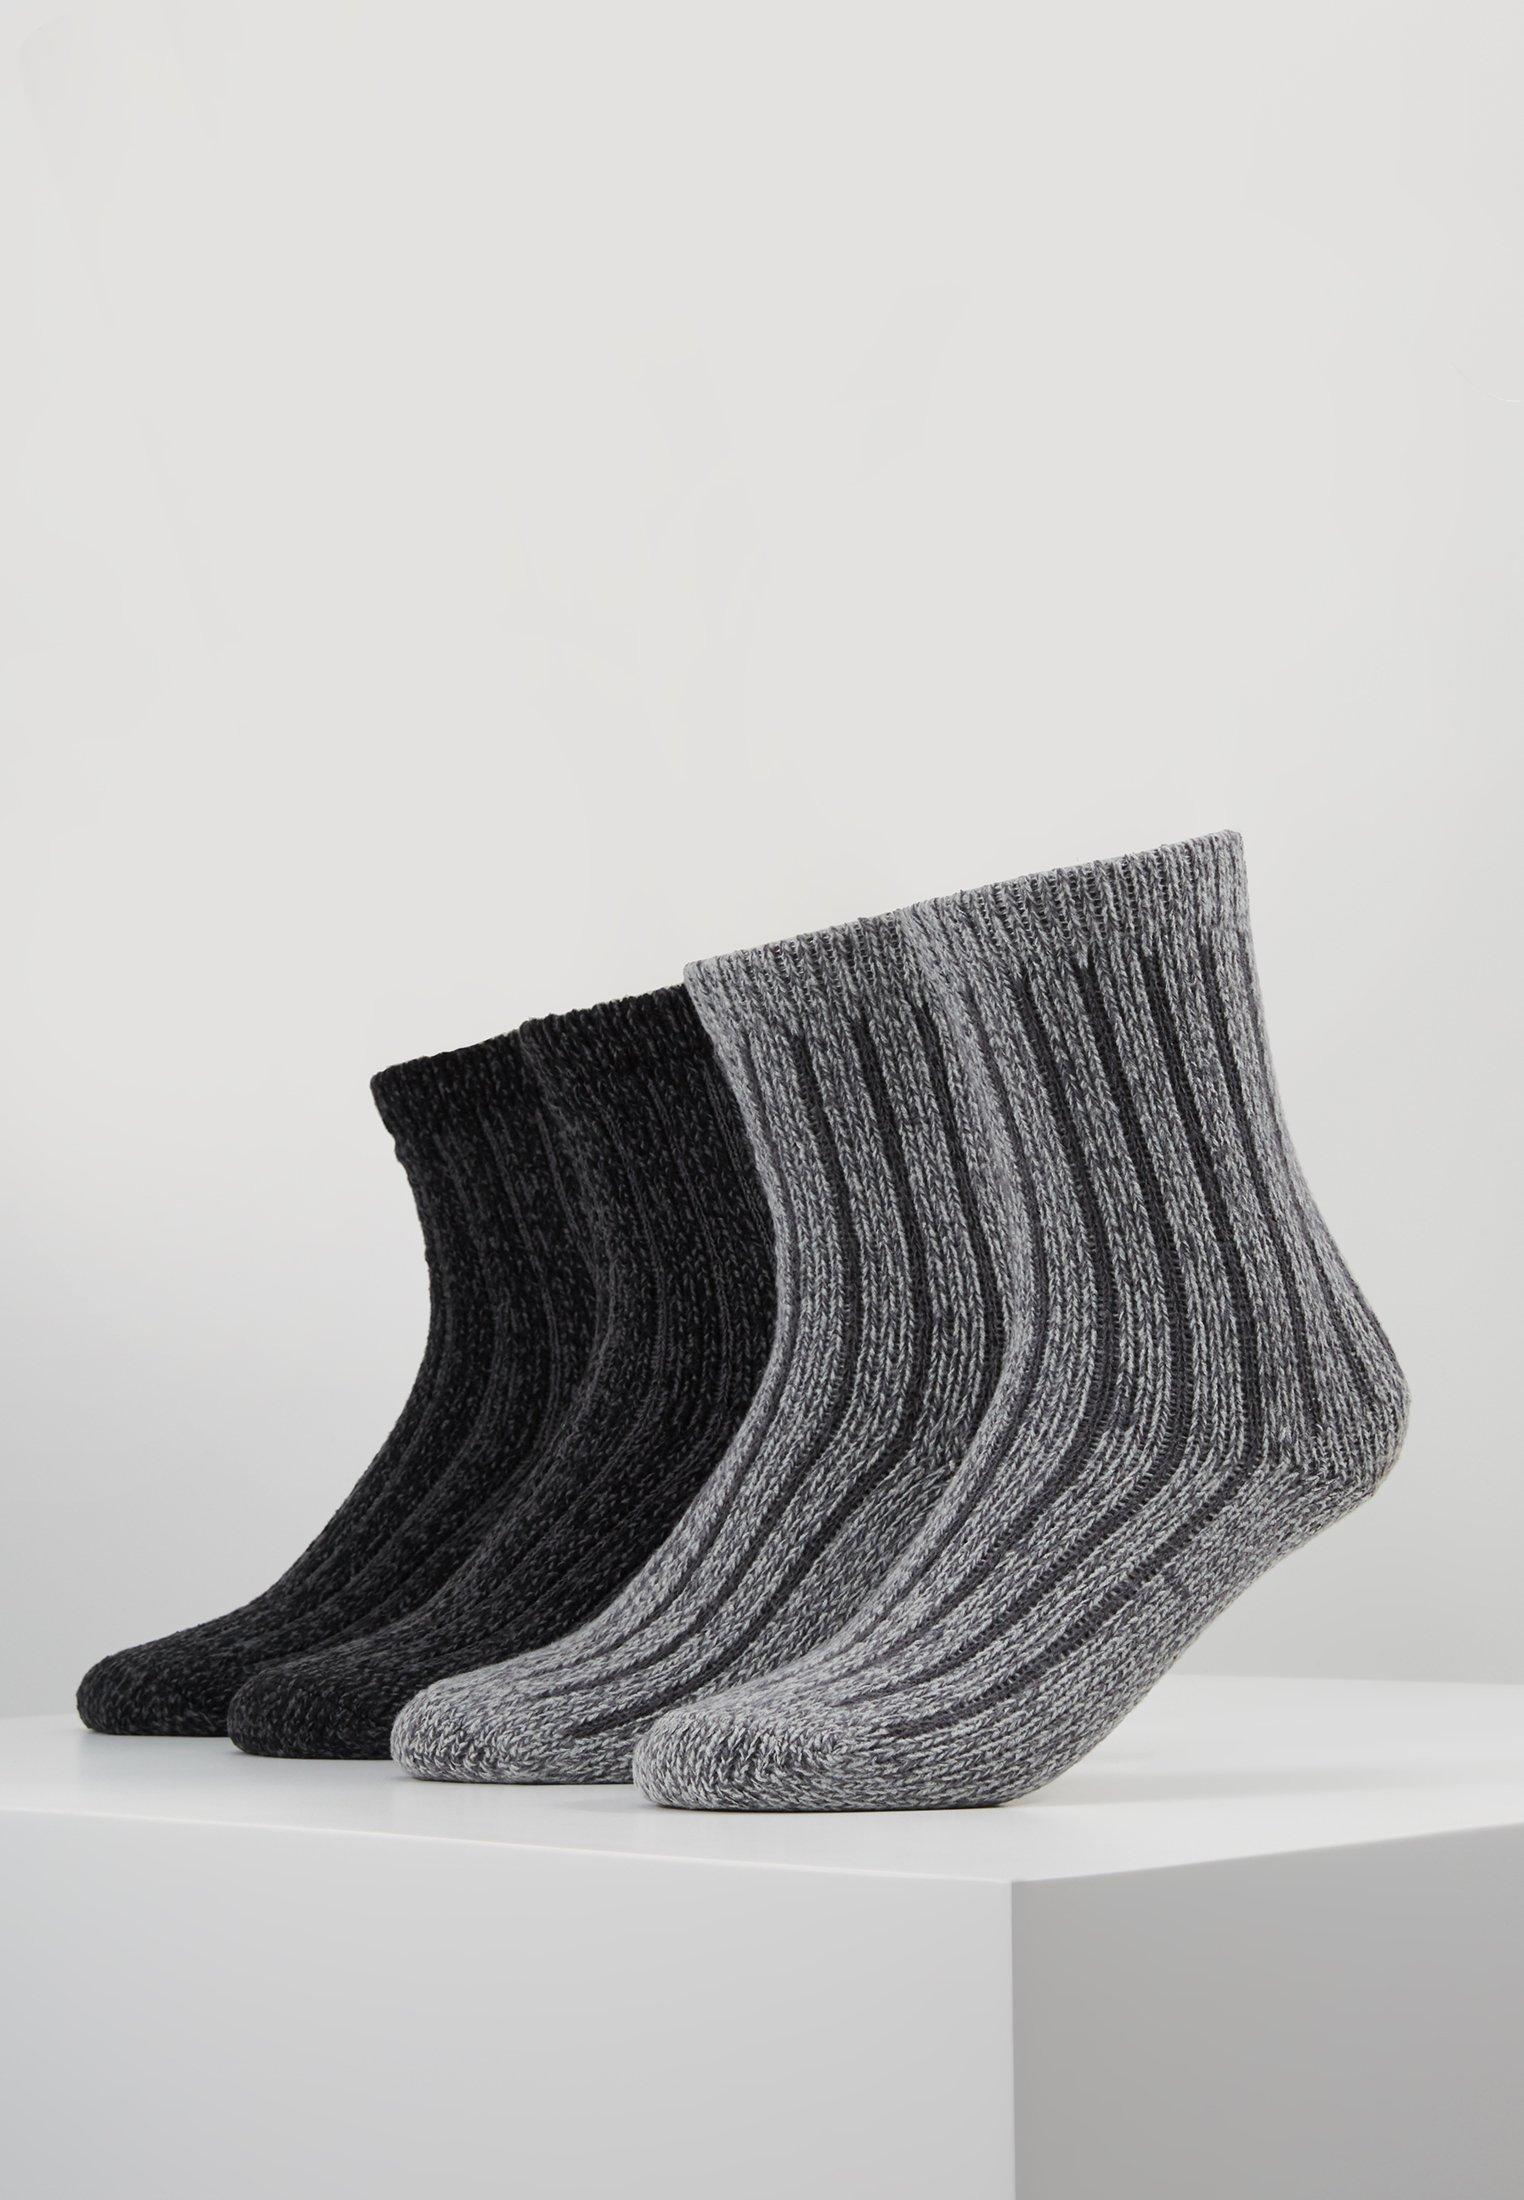 Men UNISEX FASHION HYGGE 4 PACK - Socks